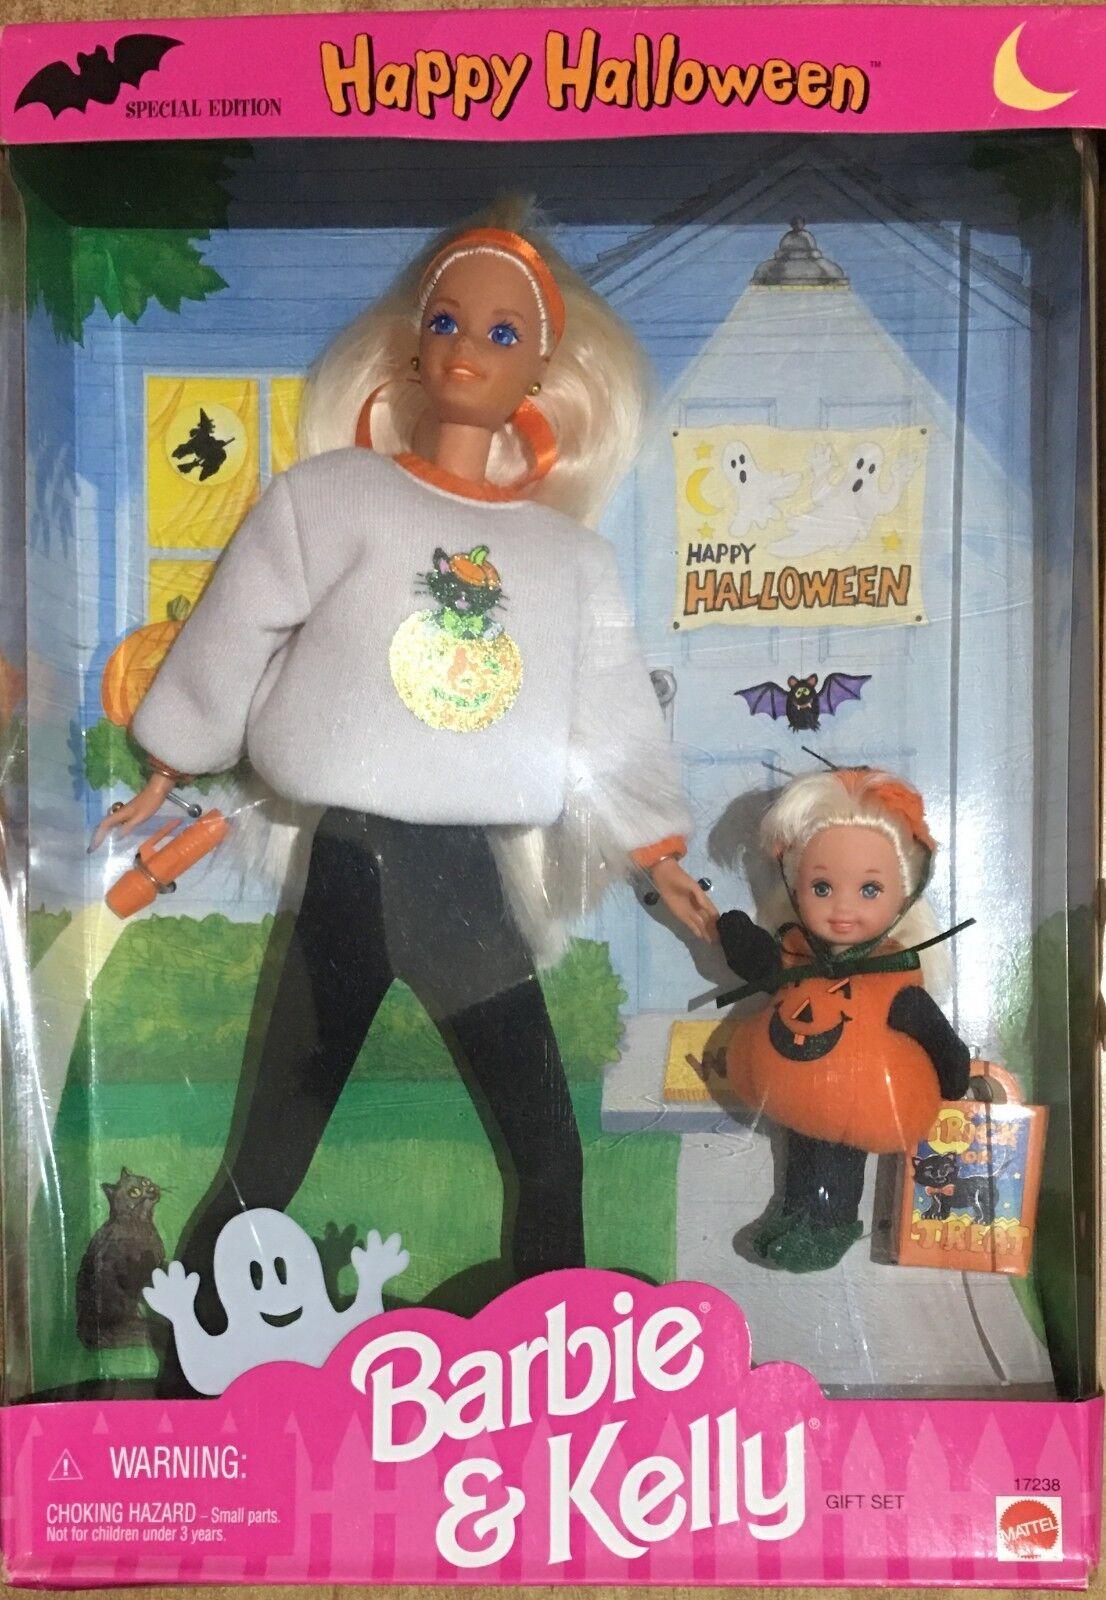 Barbie Mattel Happy Halloween Barbie&Kelly Special Edition 96'